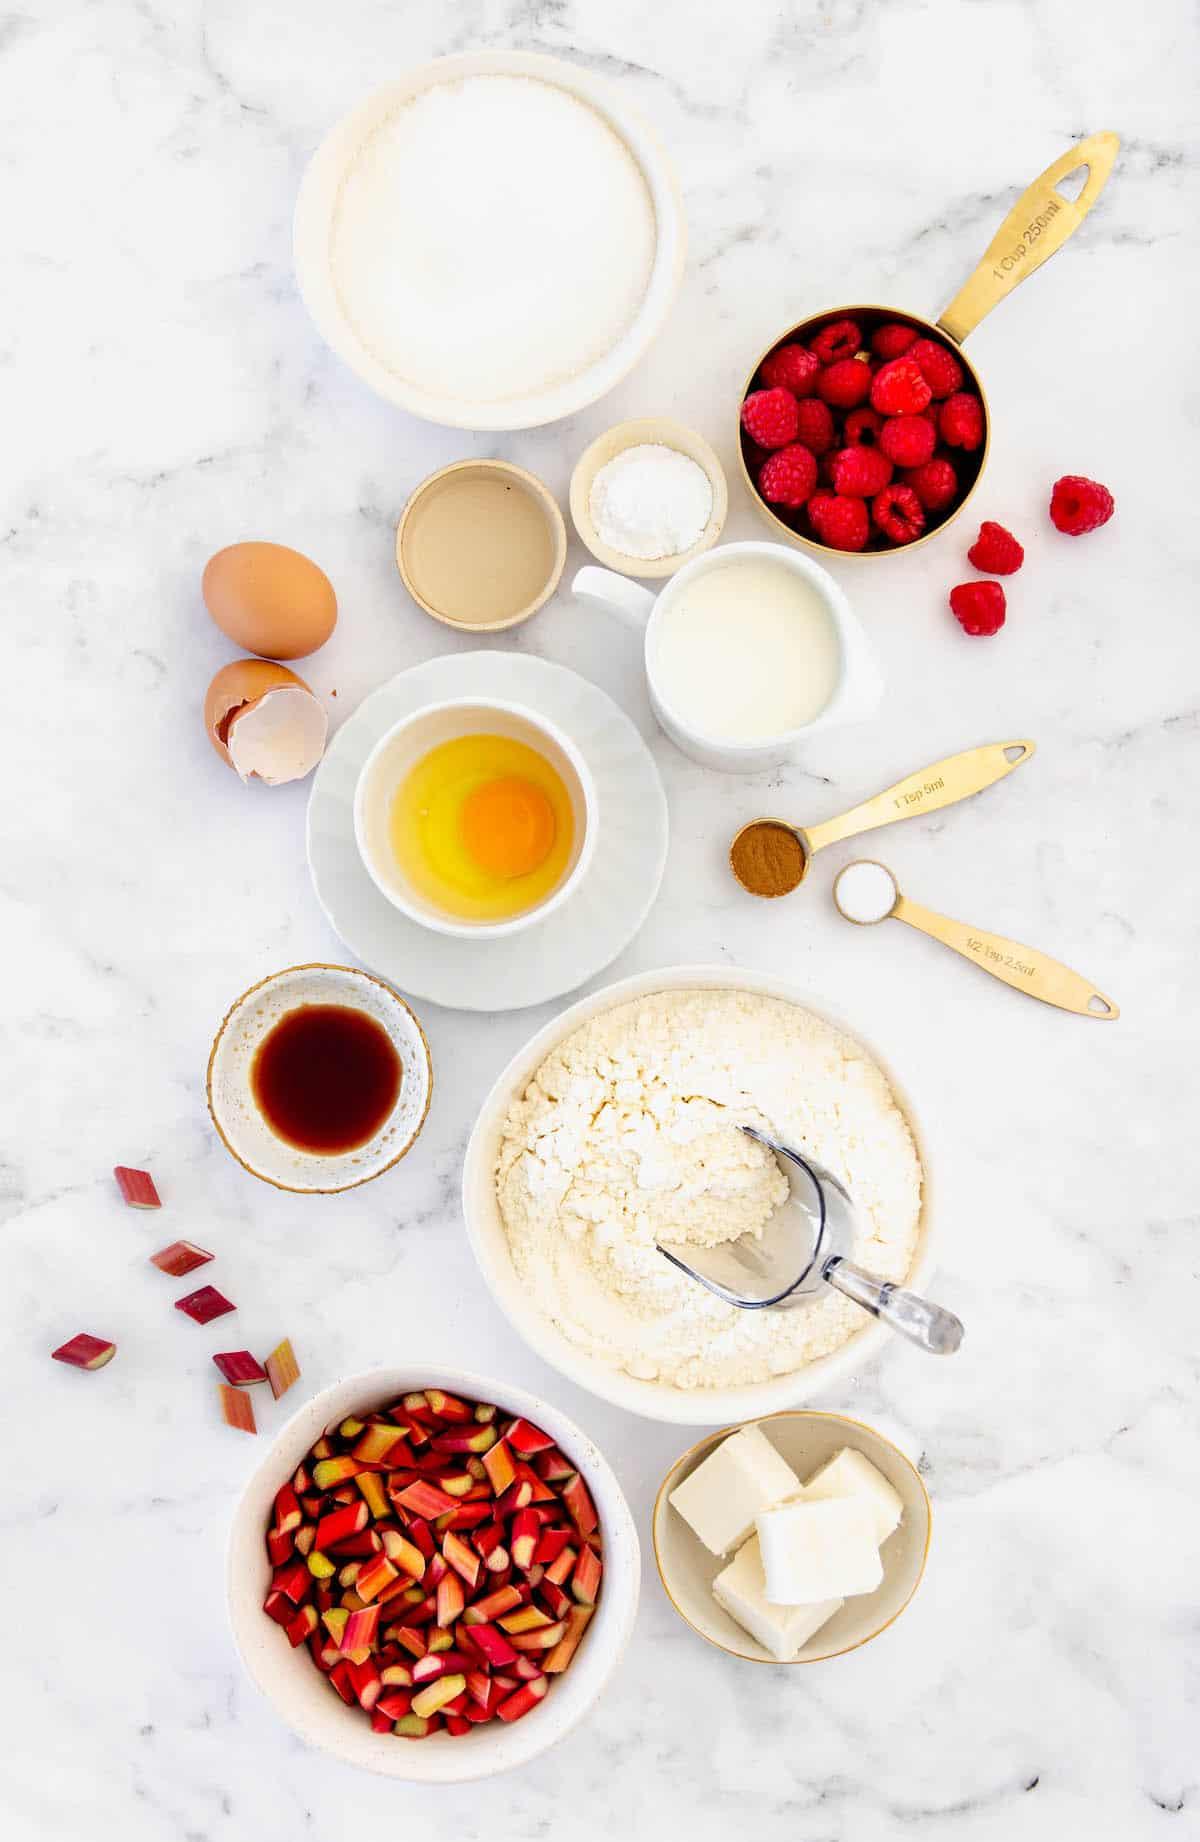 Overhead view of ingredients to make raspberry rhubarb coffee cake